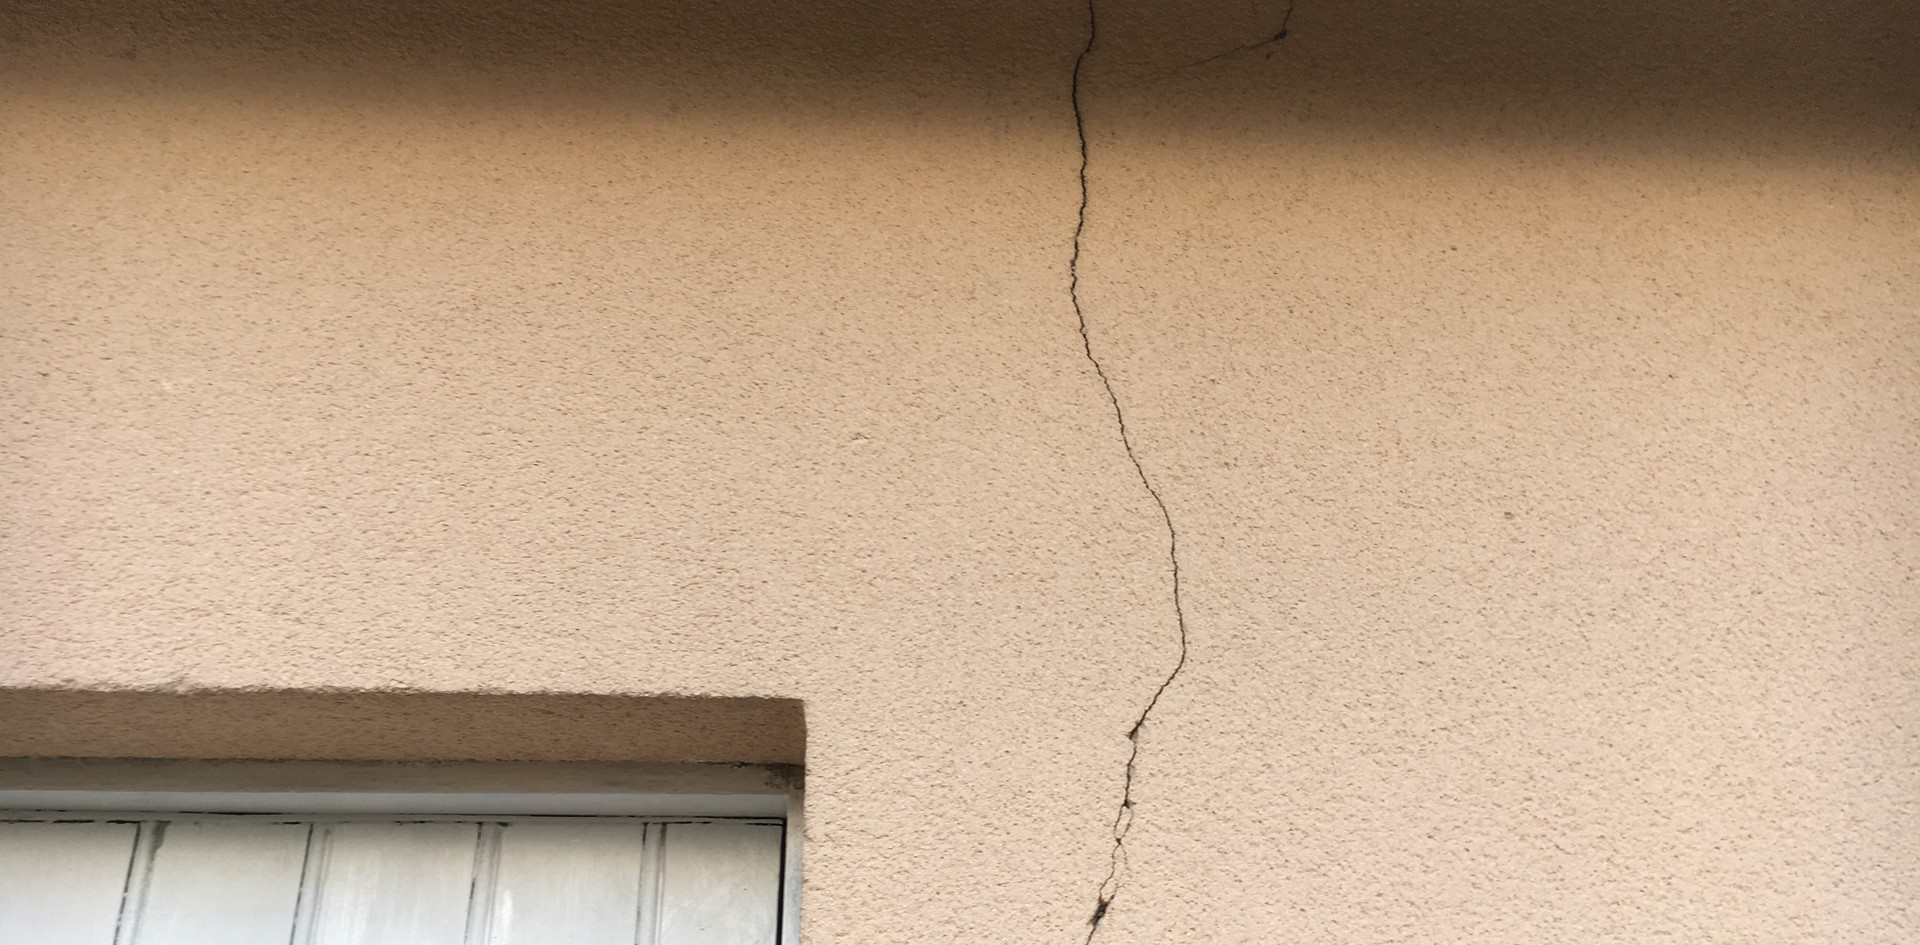 Fissures structurelle